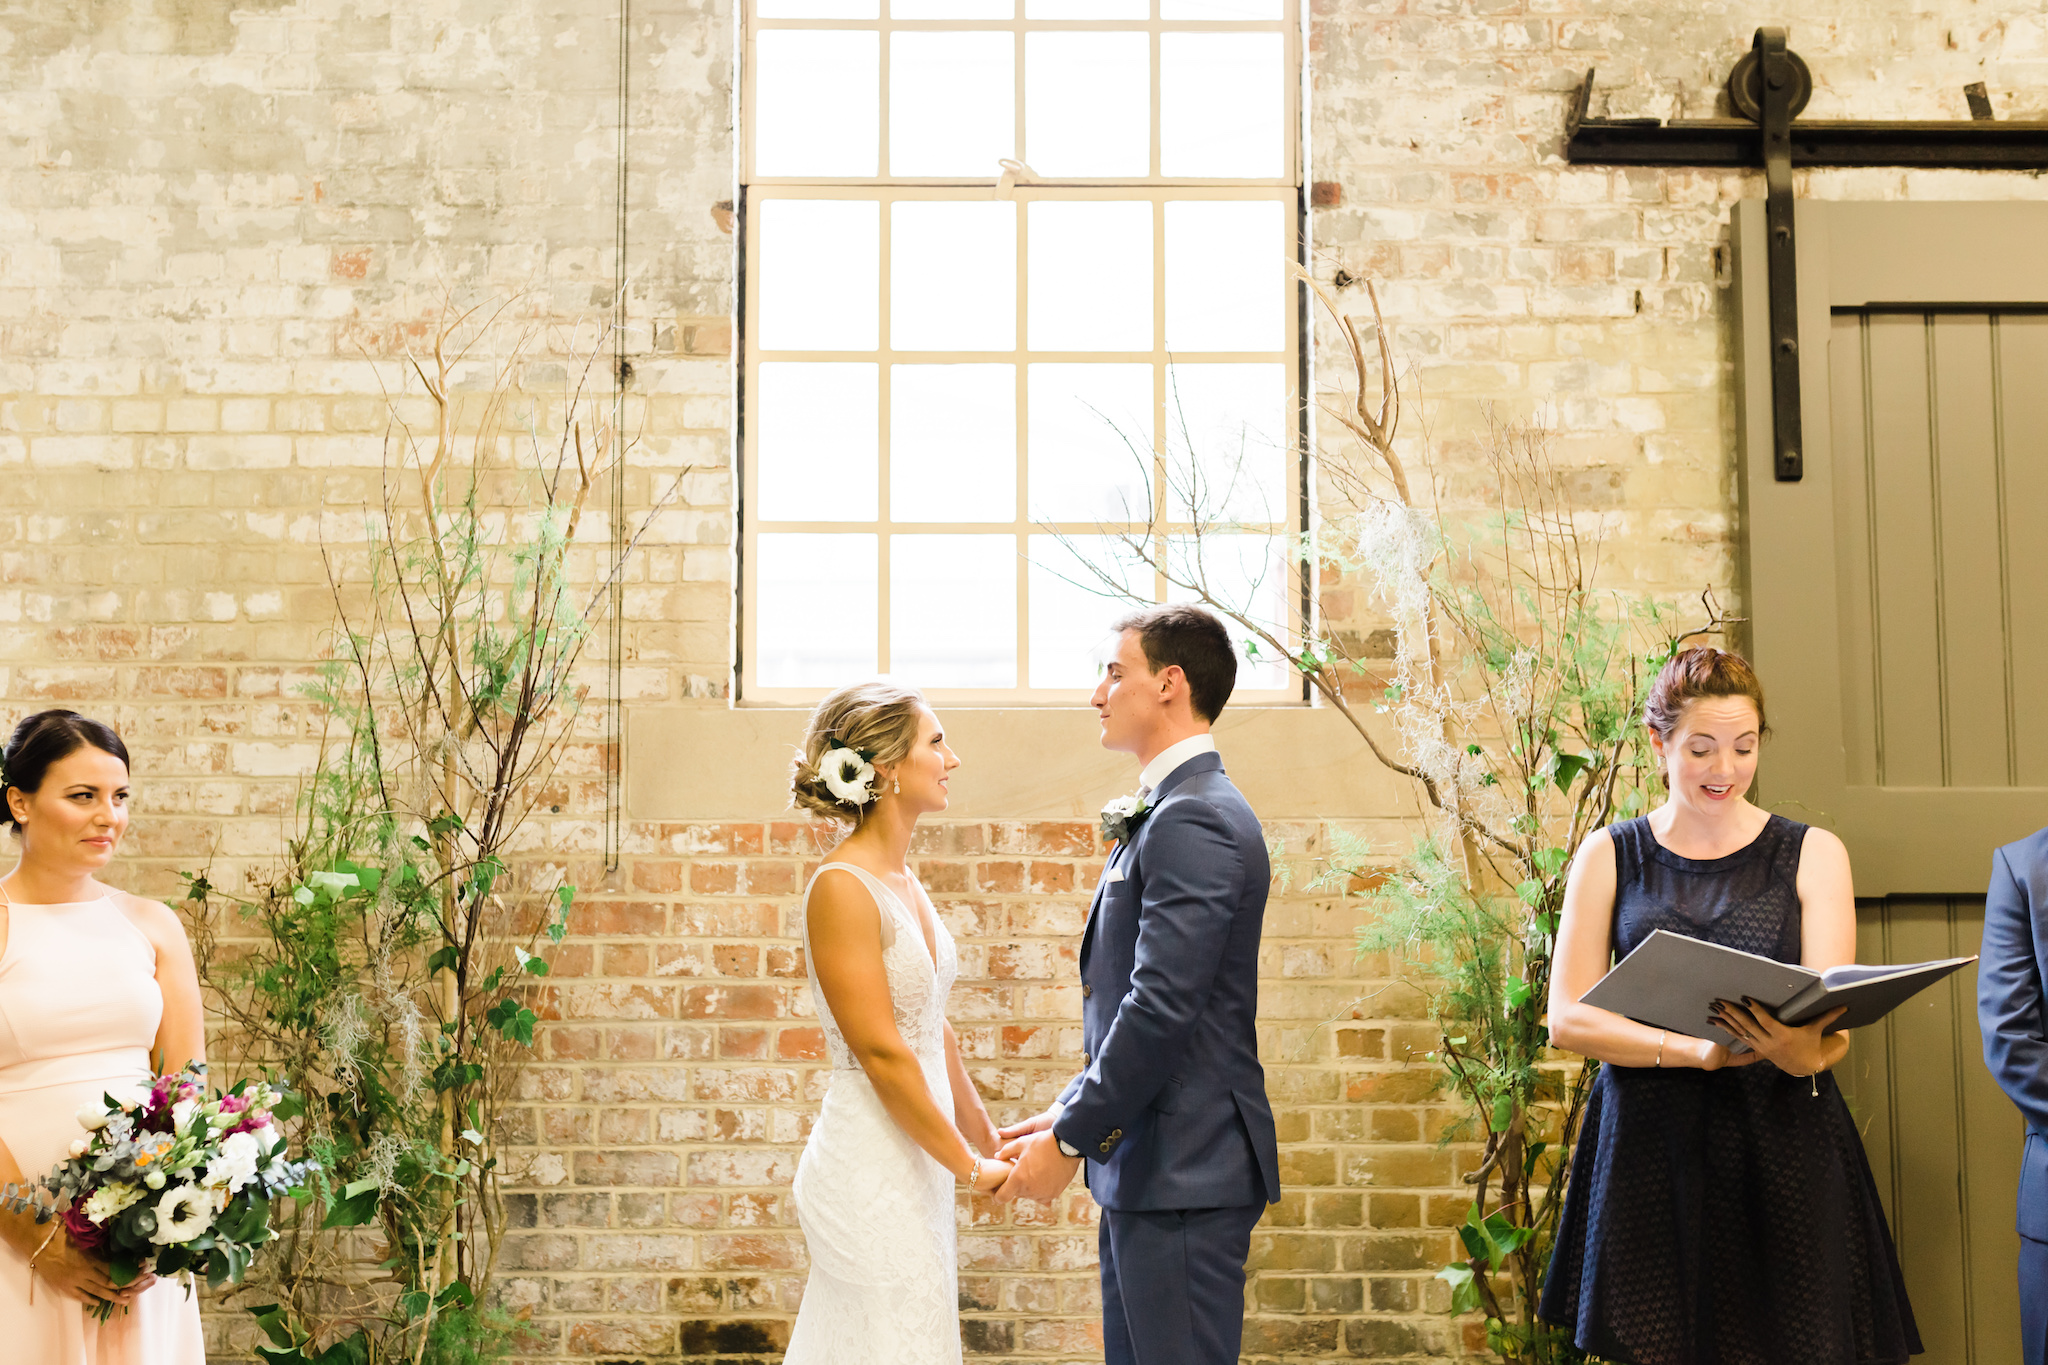 282-SOPHIE  DYLAN WEDDING.jpg